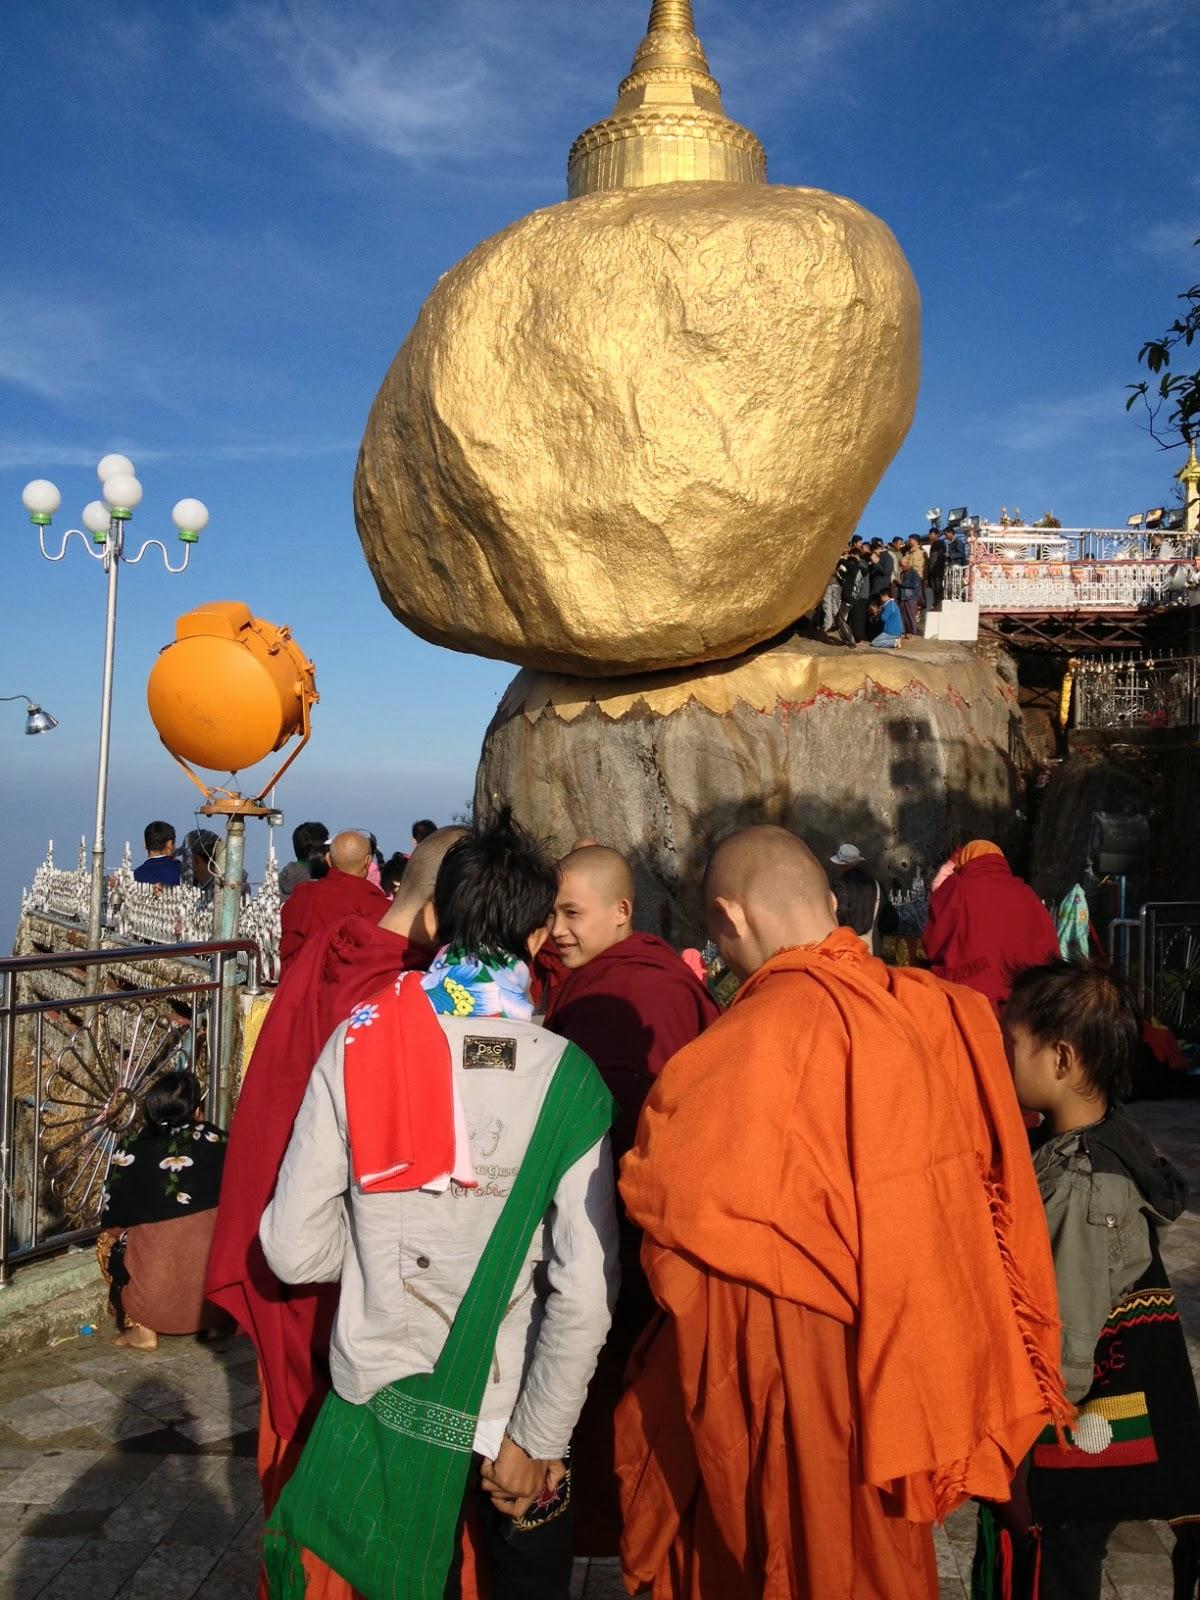 Holy Balanced Rock at Kyaiktiyo Pagoda, Burma.